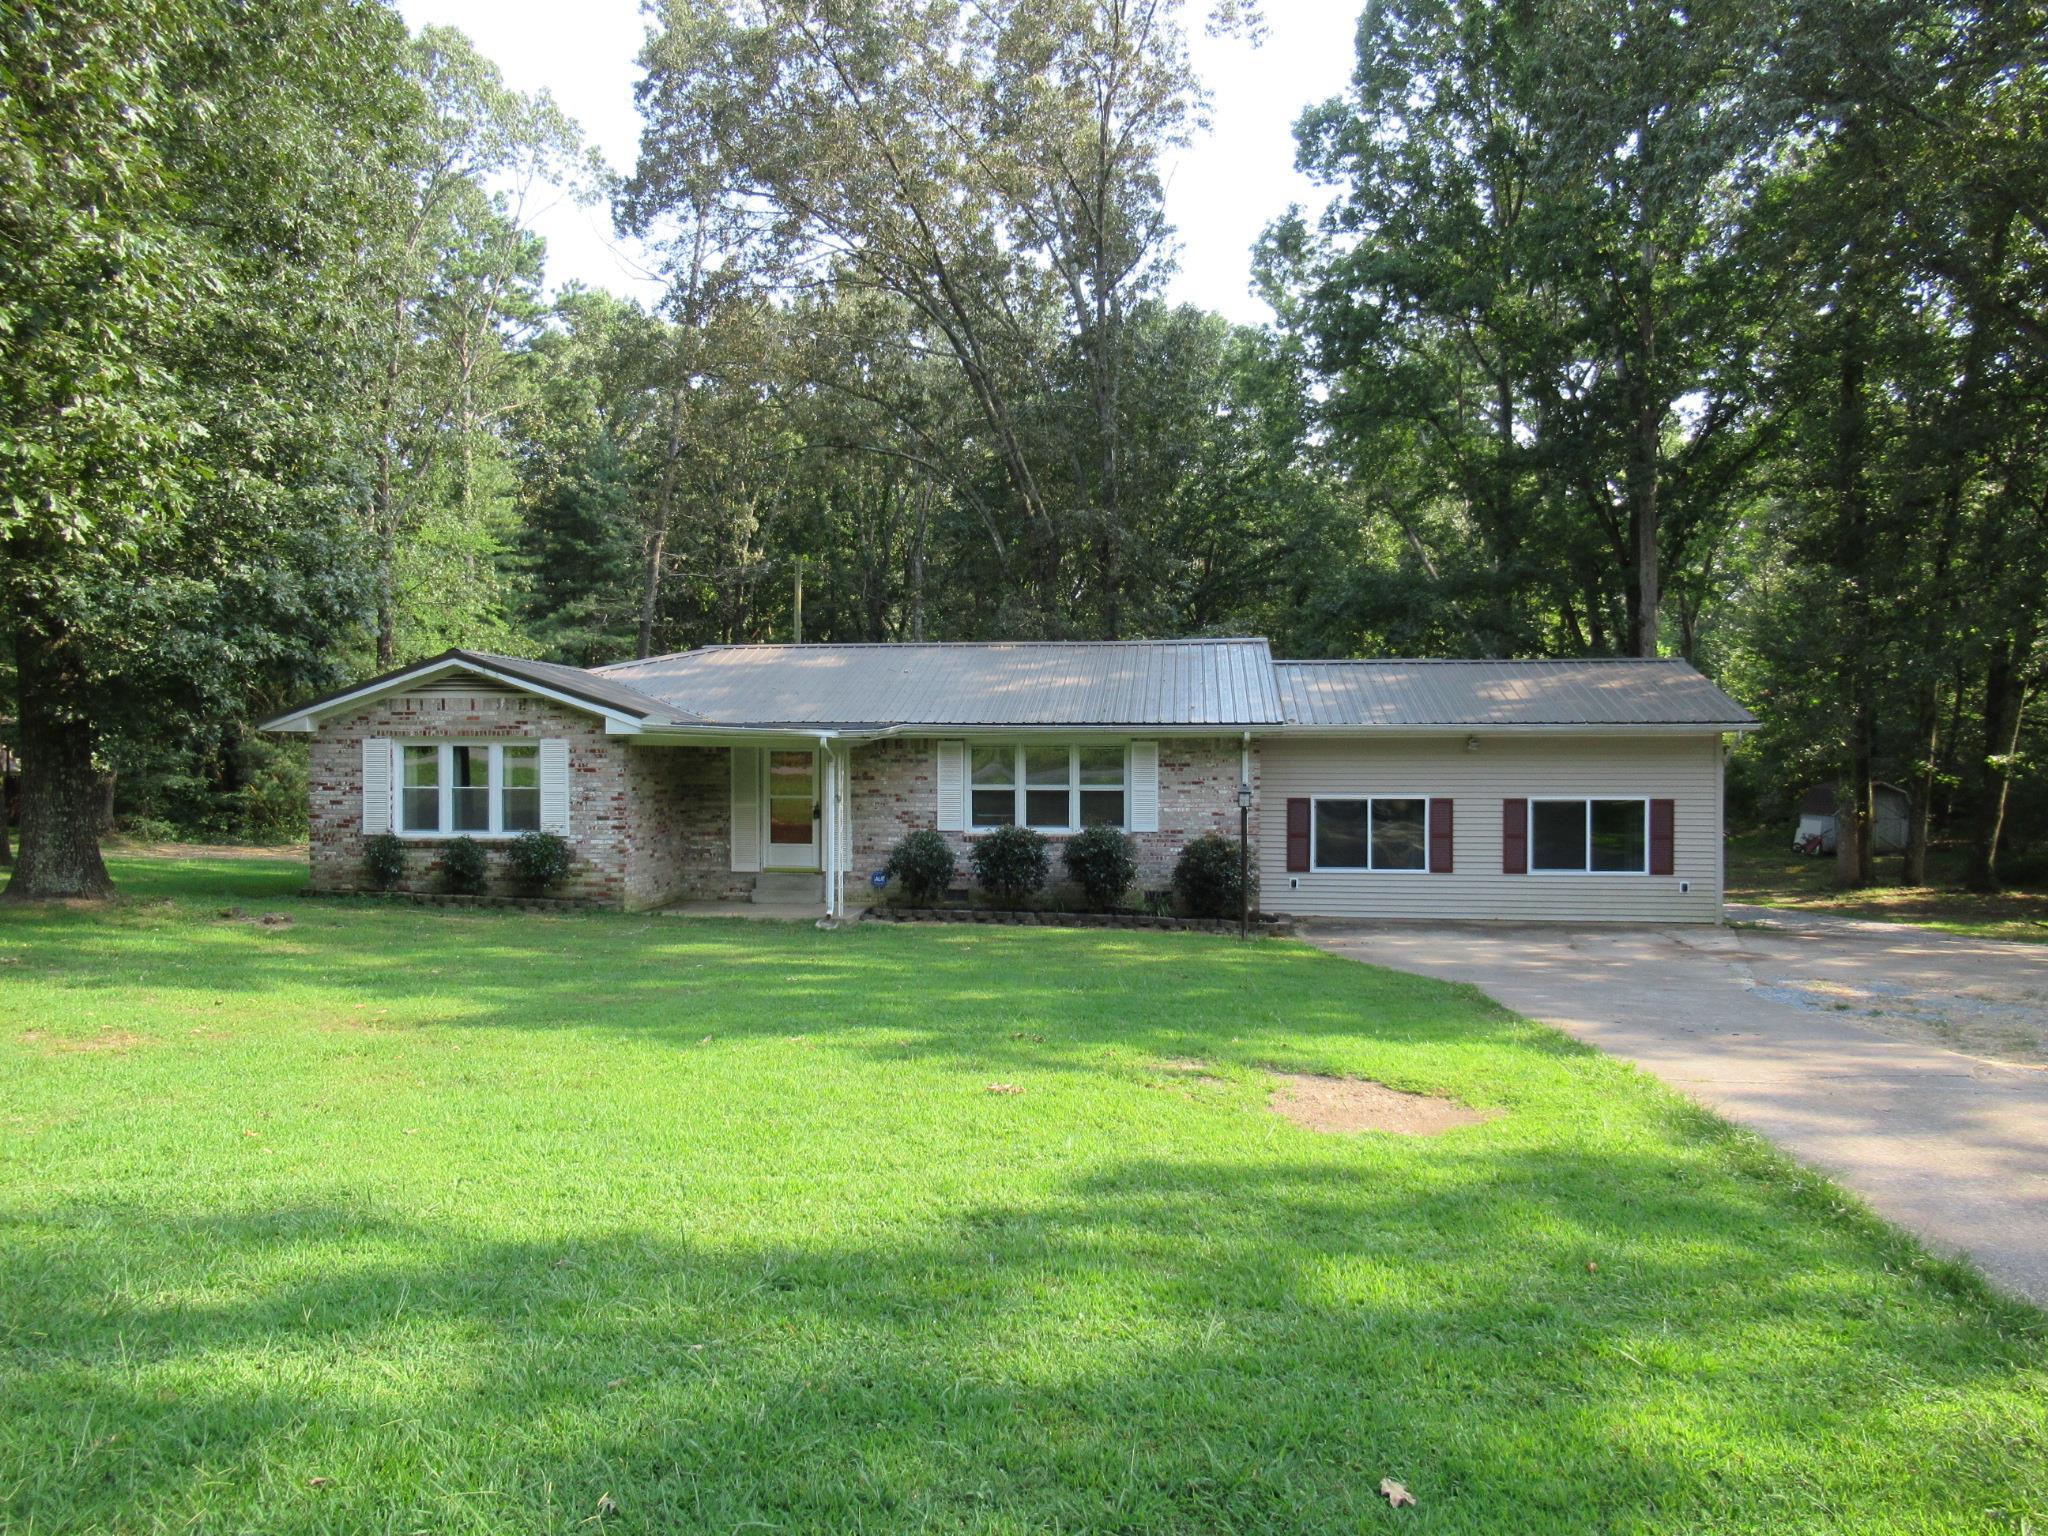 43 Hilldale Church Rd, Fayetteville, TN 37334 - Fayetteville, TN real estate listing